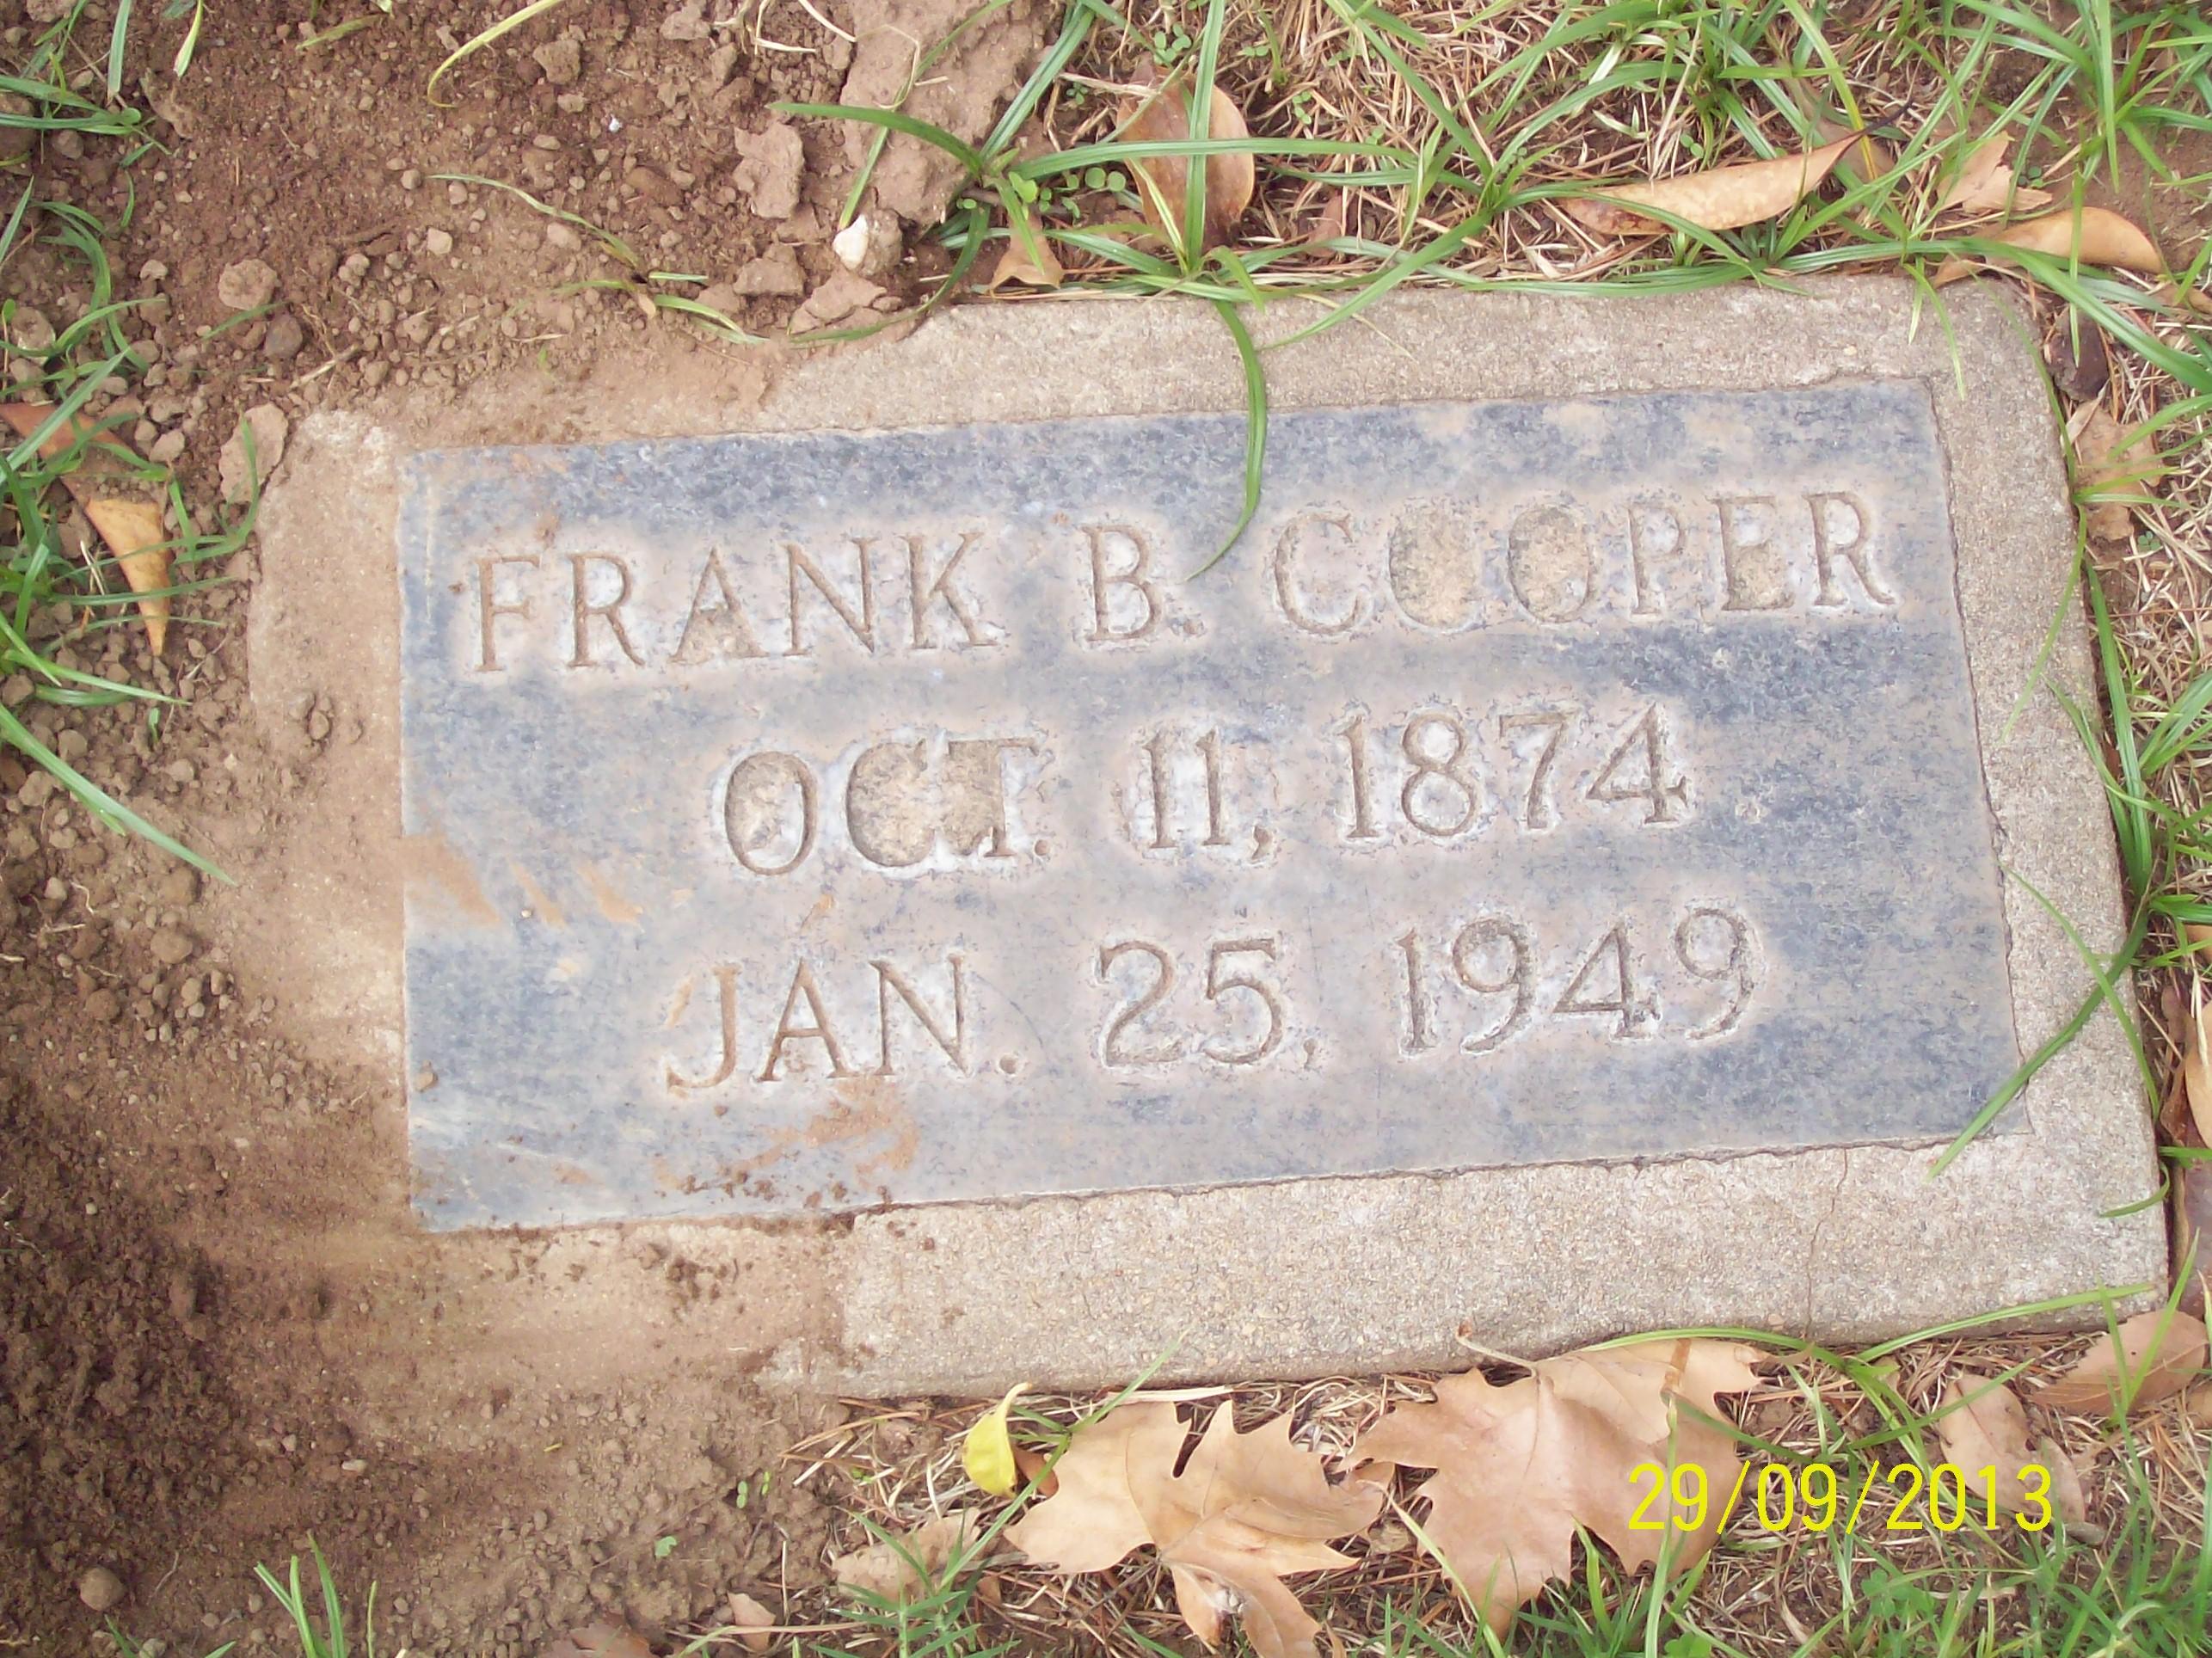 Frank B. Cooper